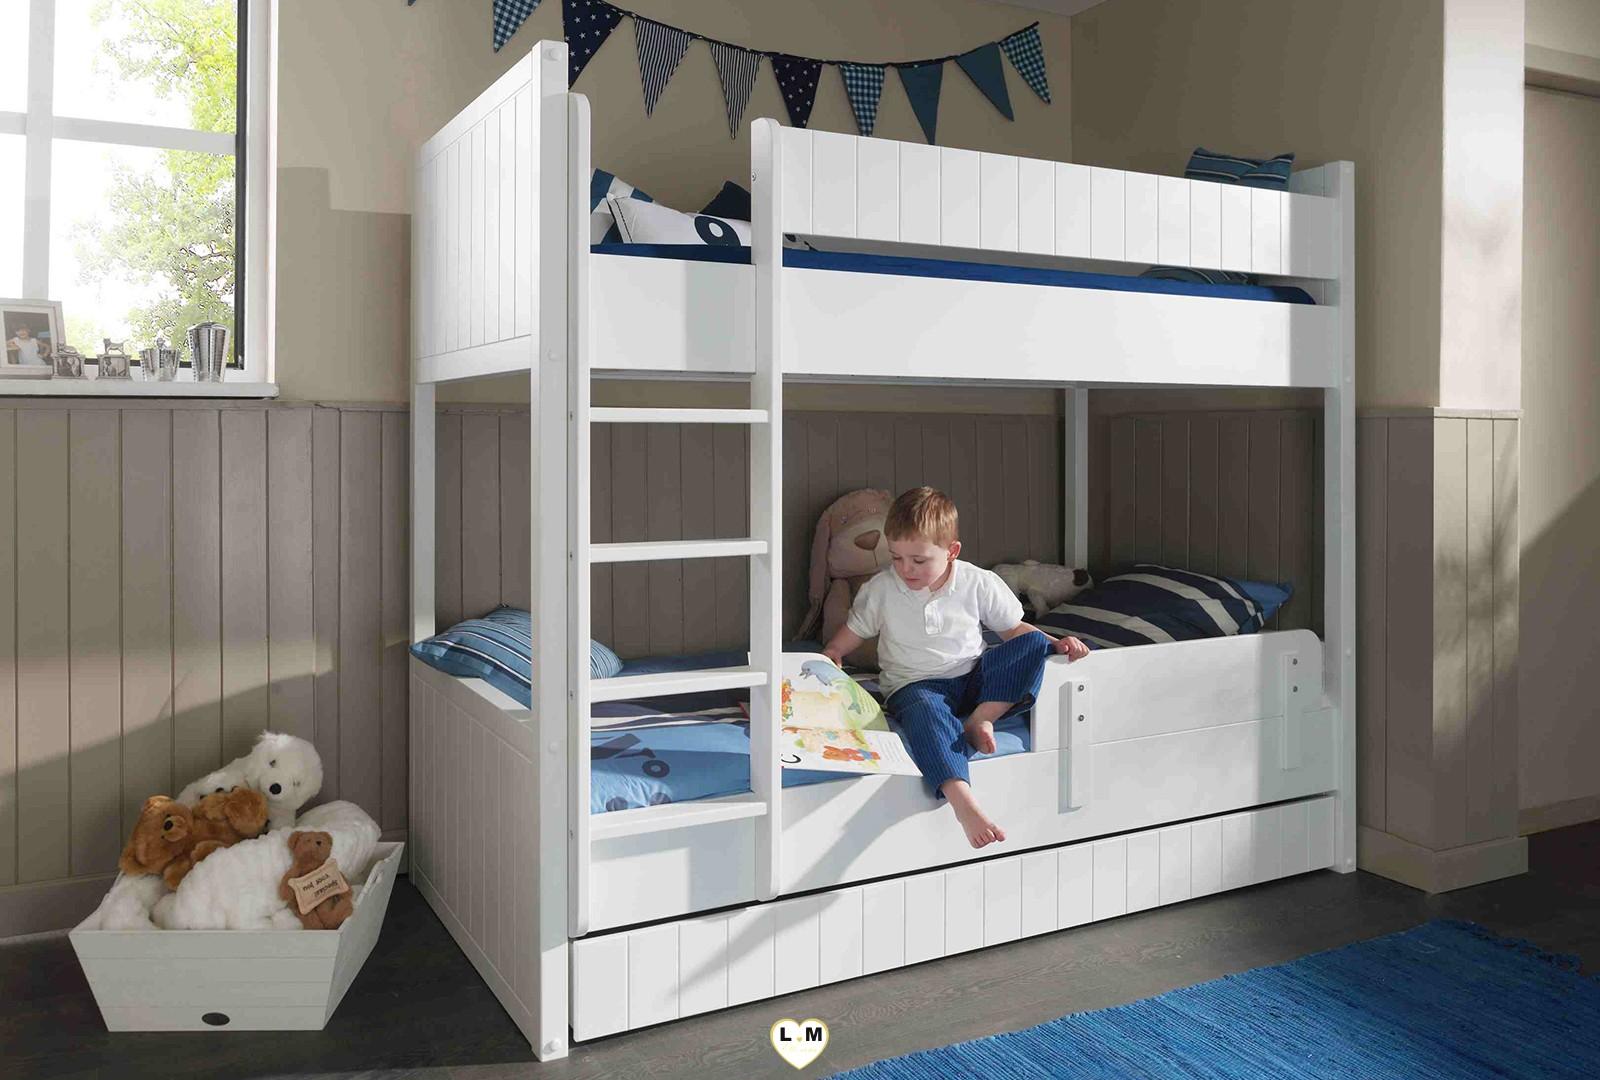 robinson chambre enfant le lit superpose lignemeuble com. Black Bedroom Furniture Sets. Home Design Ideas